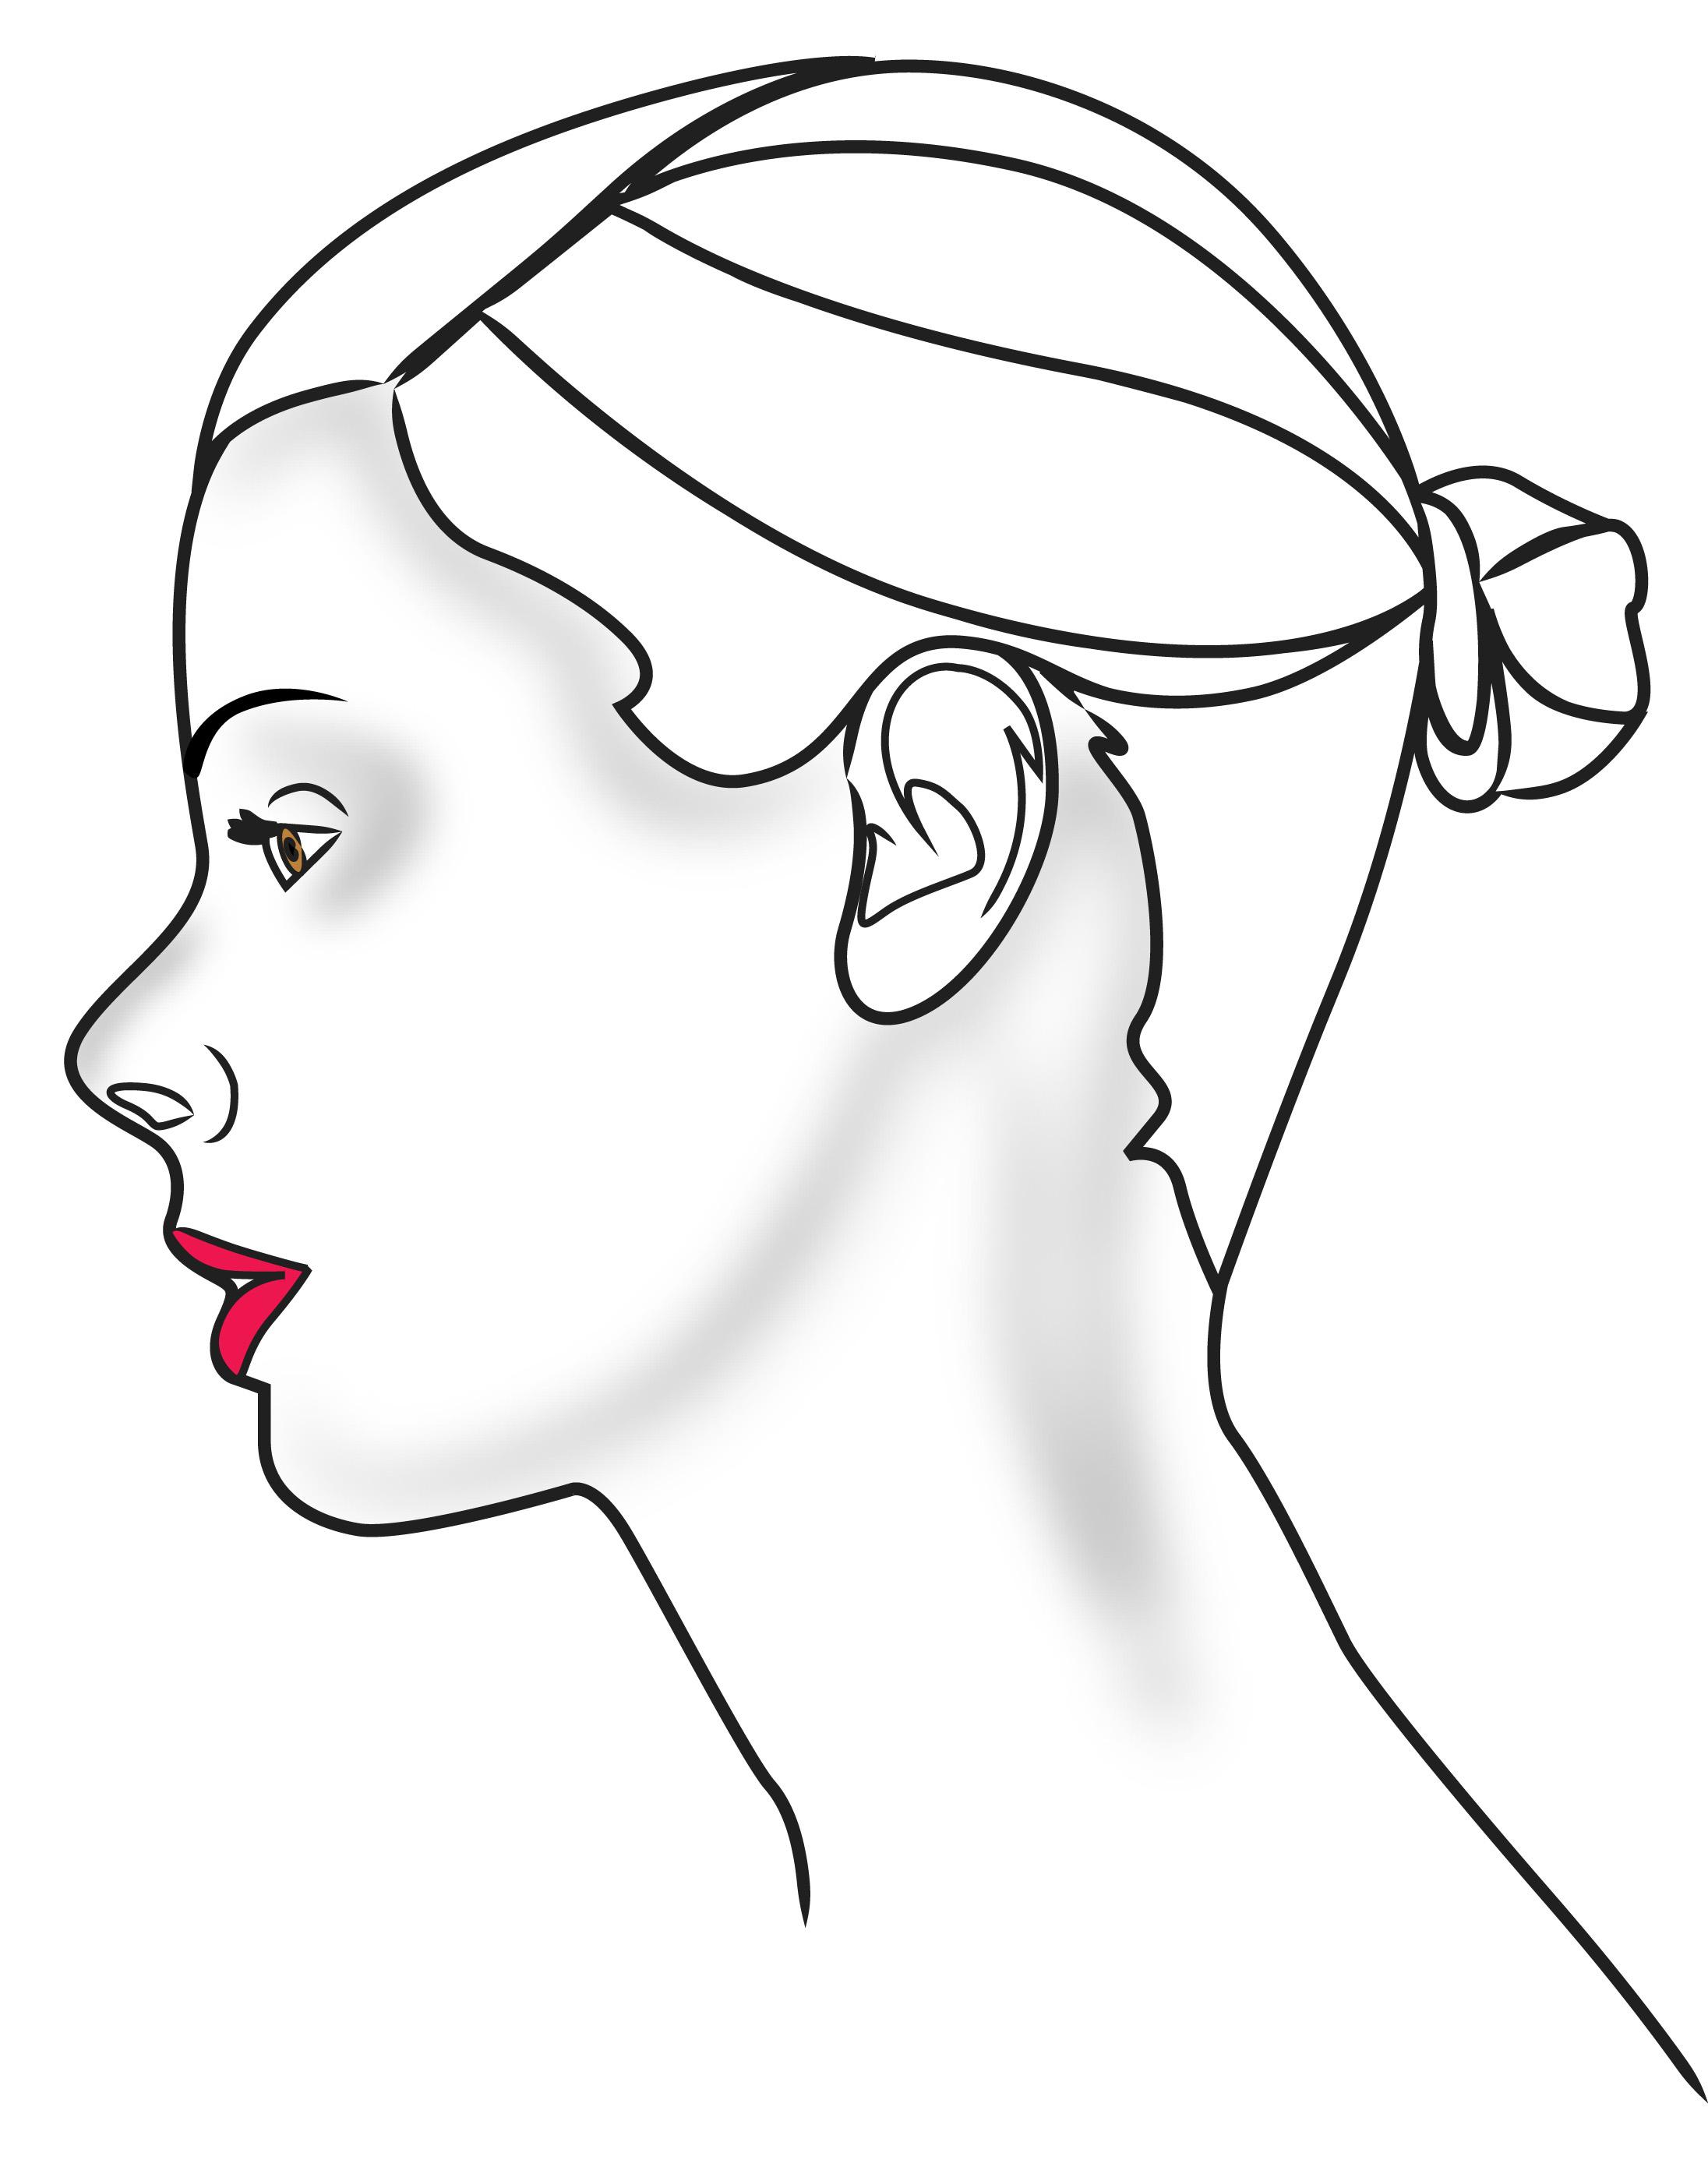 Human Head Outline